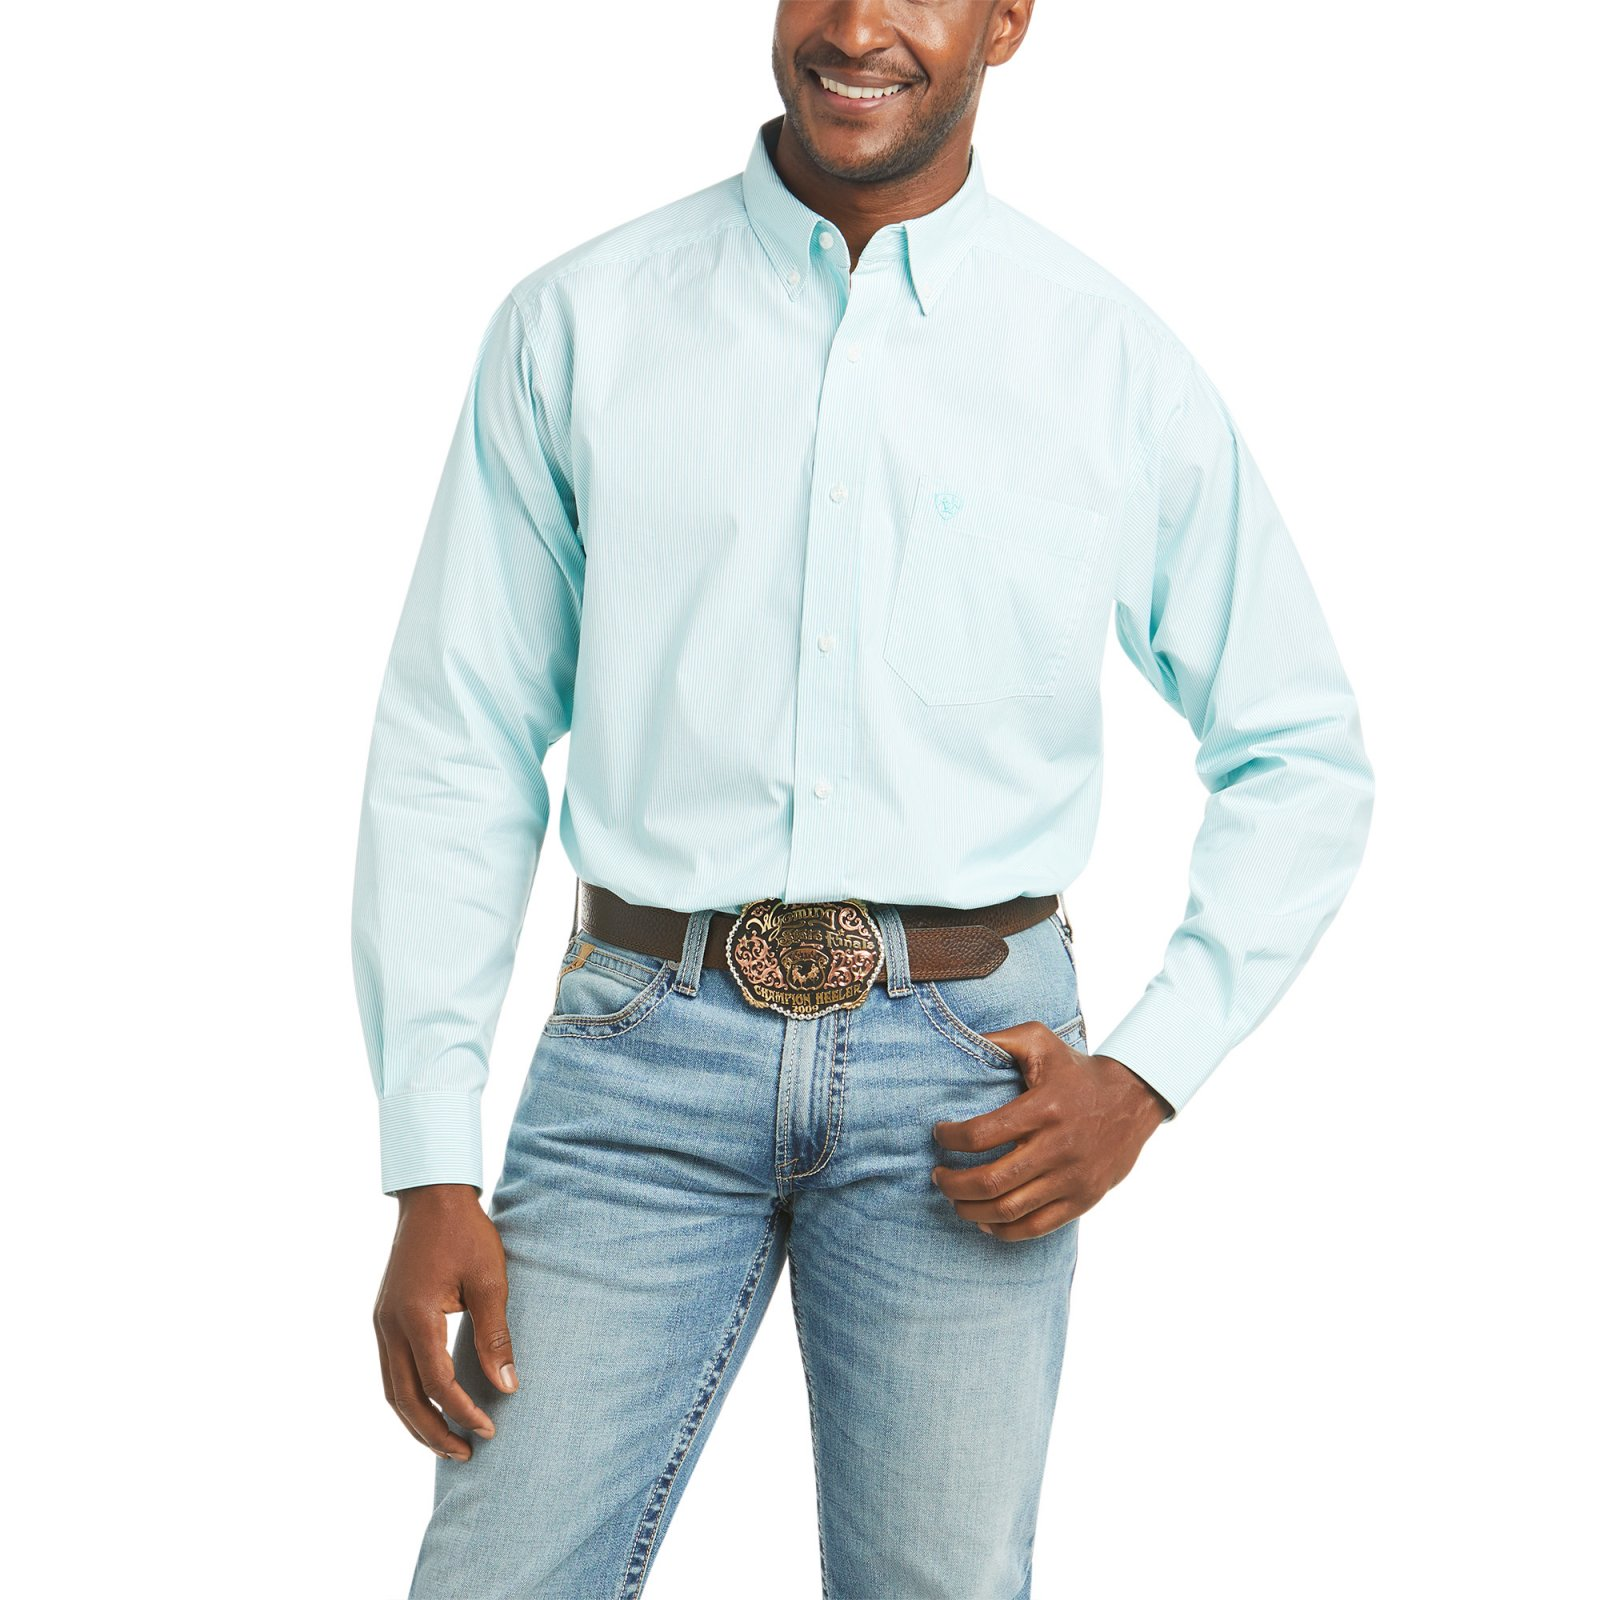 Pro Series Dayne Mini Stripe Shirt from Ariat